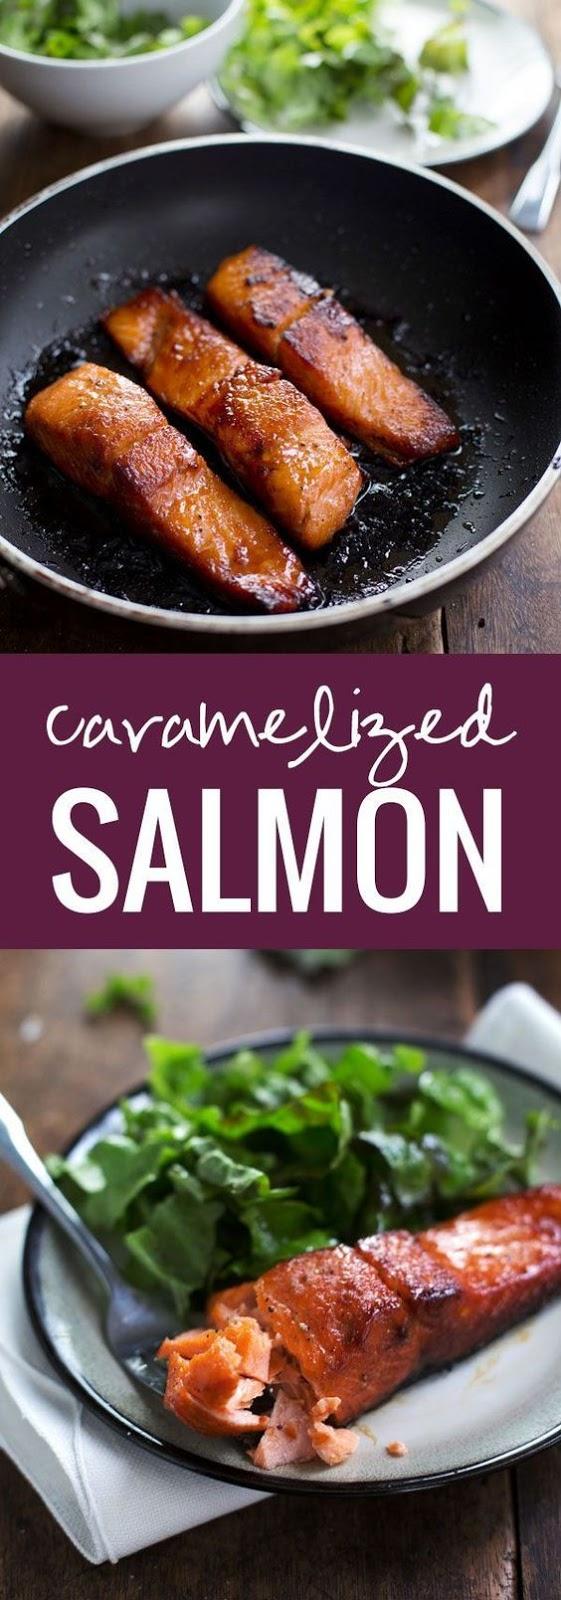 4 Ingredients Caramelized Salmon